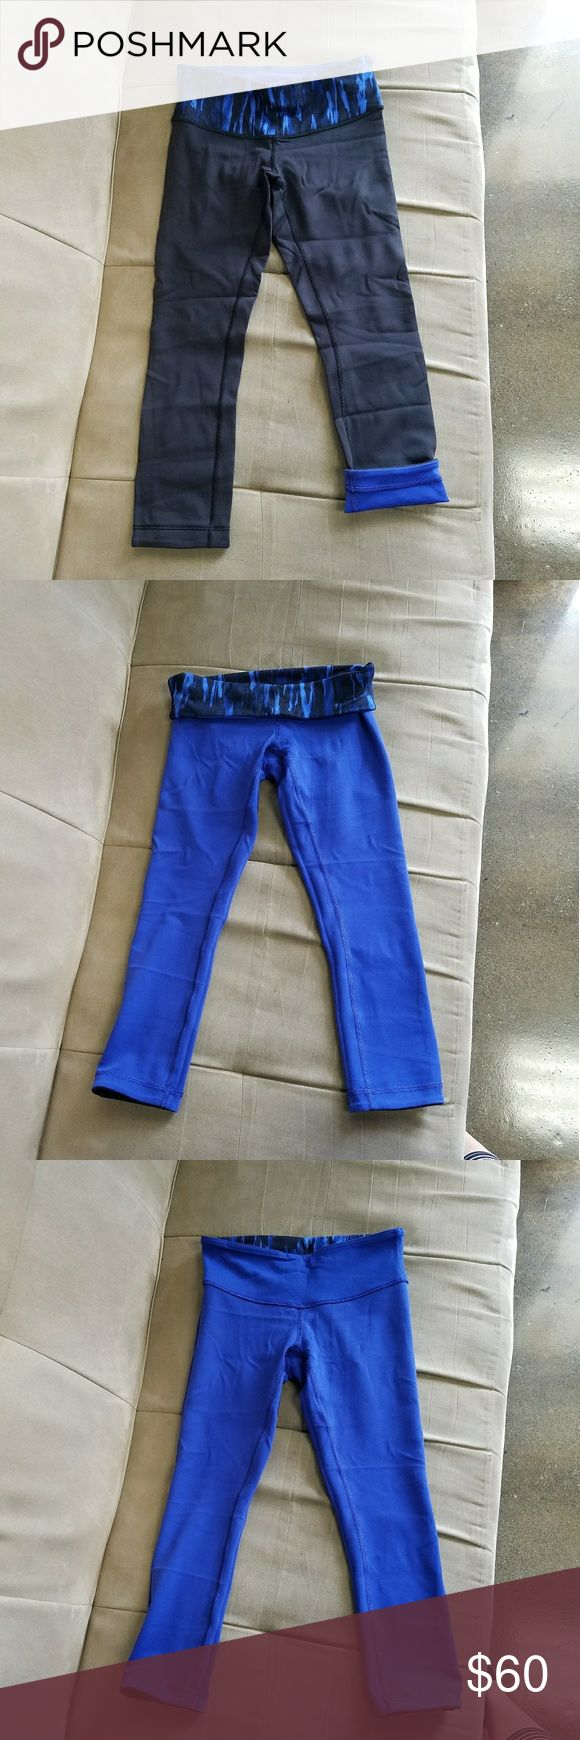 "Lululemon black blue reversible wunder under crops Blue/black reversible wunder under crops with ""painted"" pattern royal blue waistband. No pilling. Excellent condition. lululemon athletica Pants Leggings"